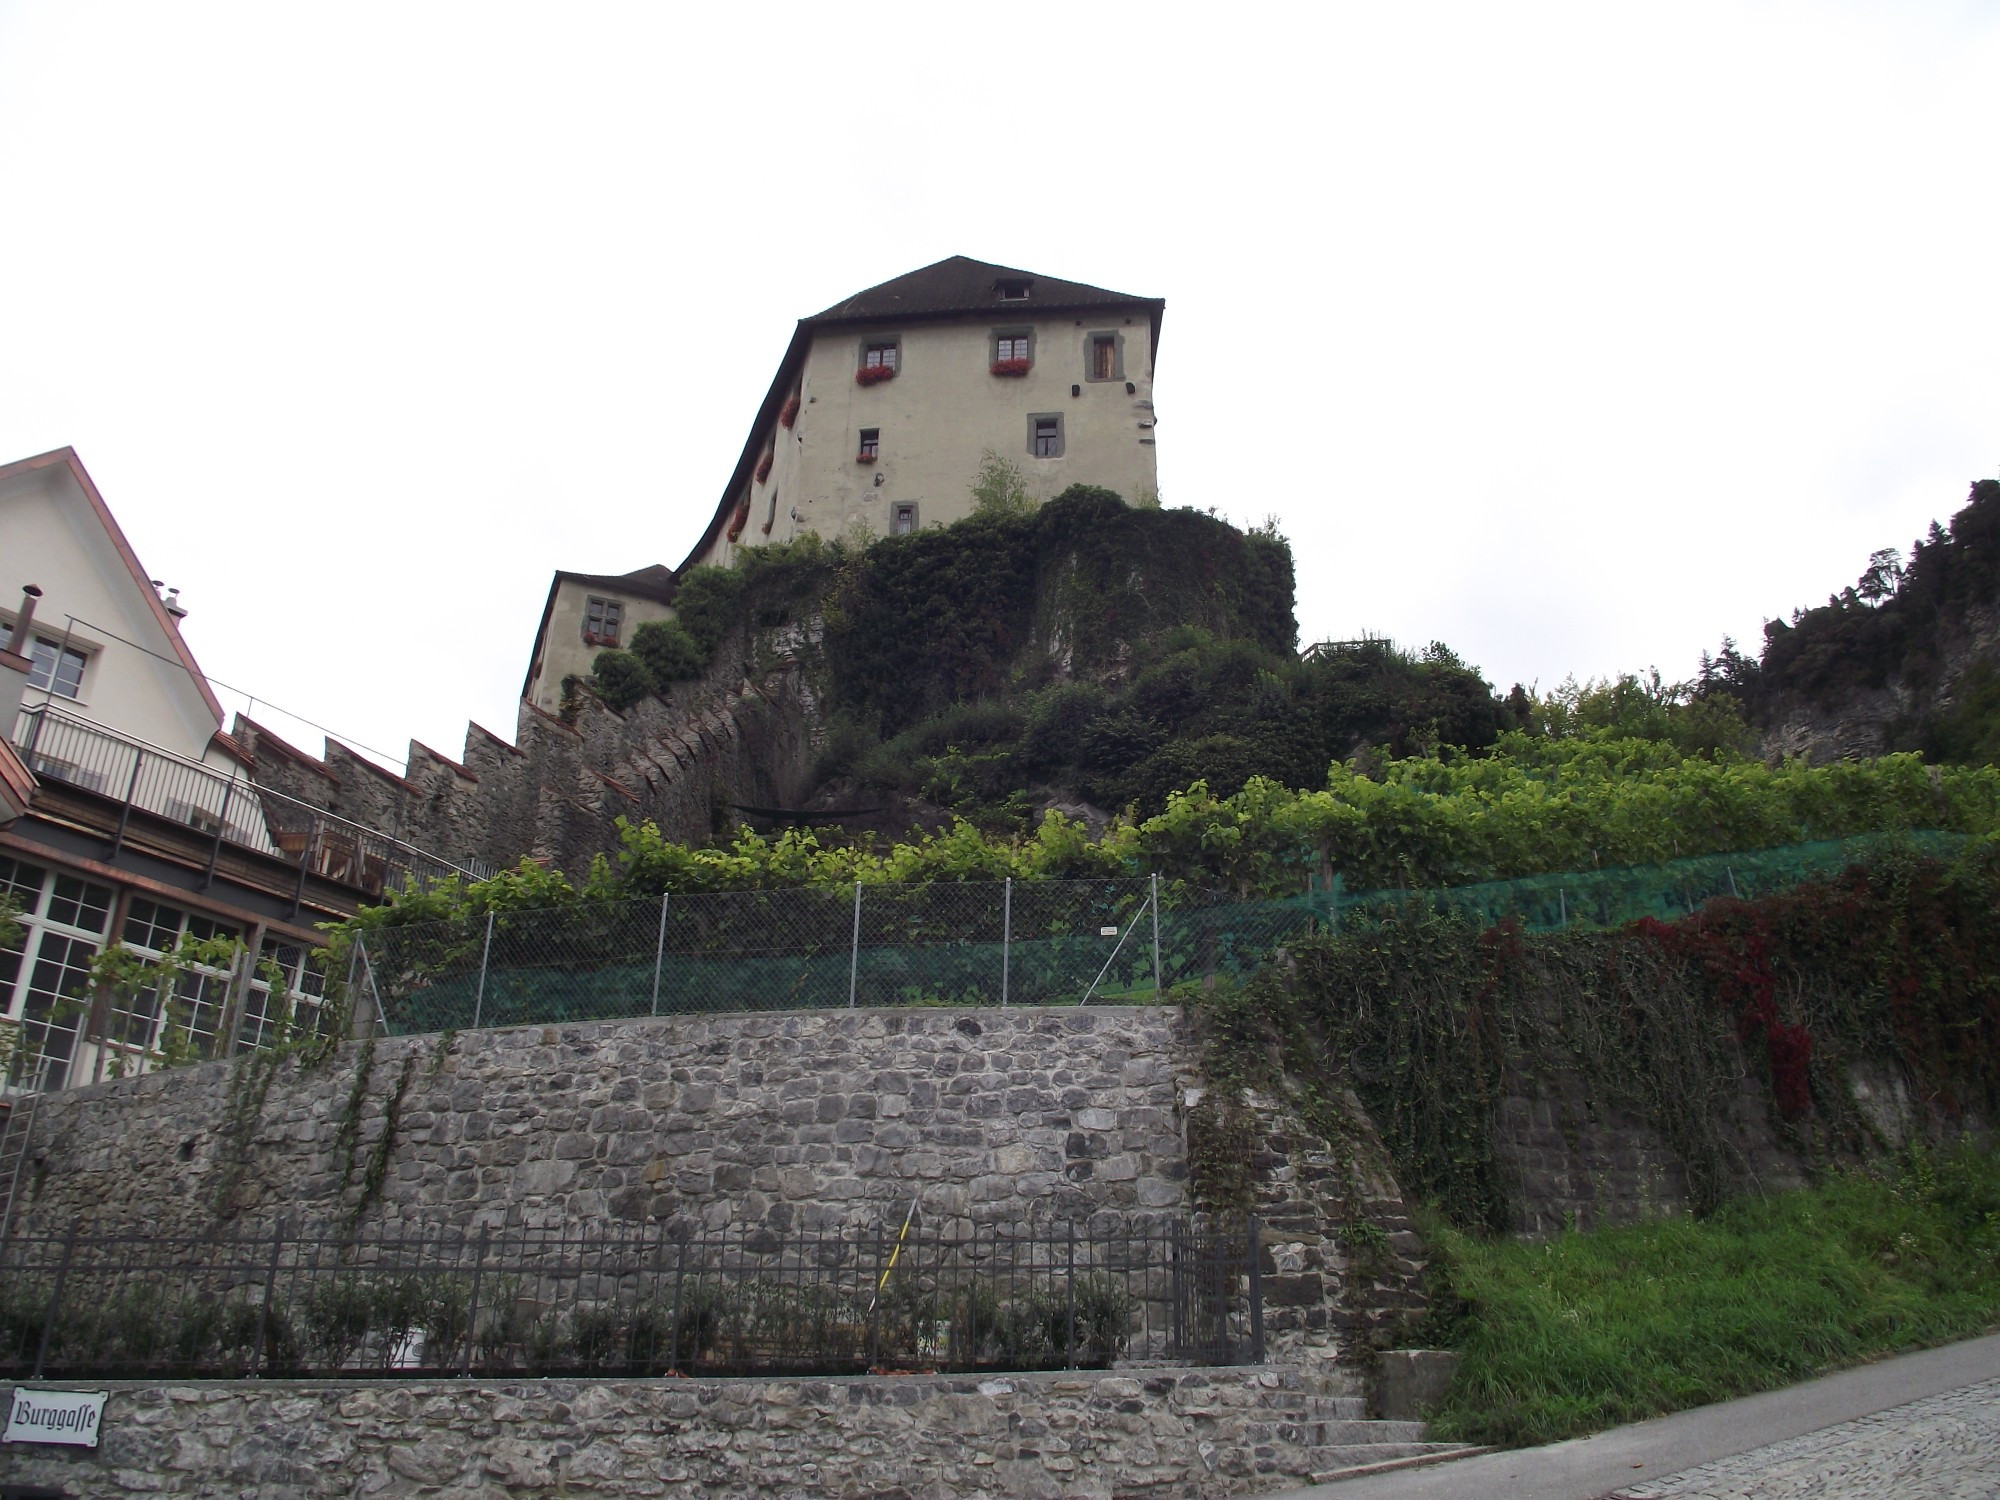 Фельдкирх (Австрия). Замок Шаттенбург. (19.09.2017)